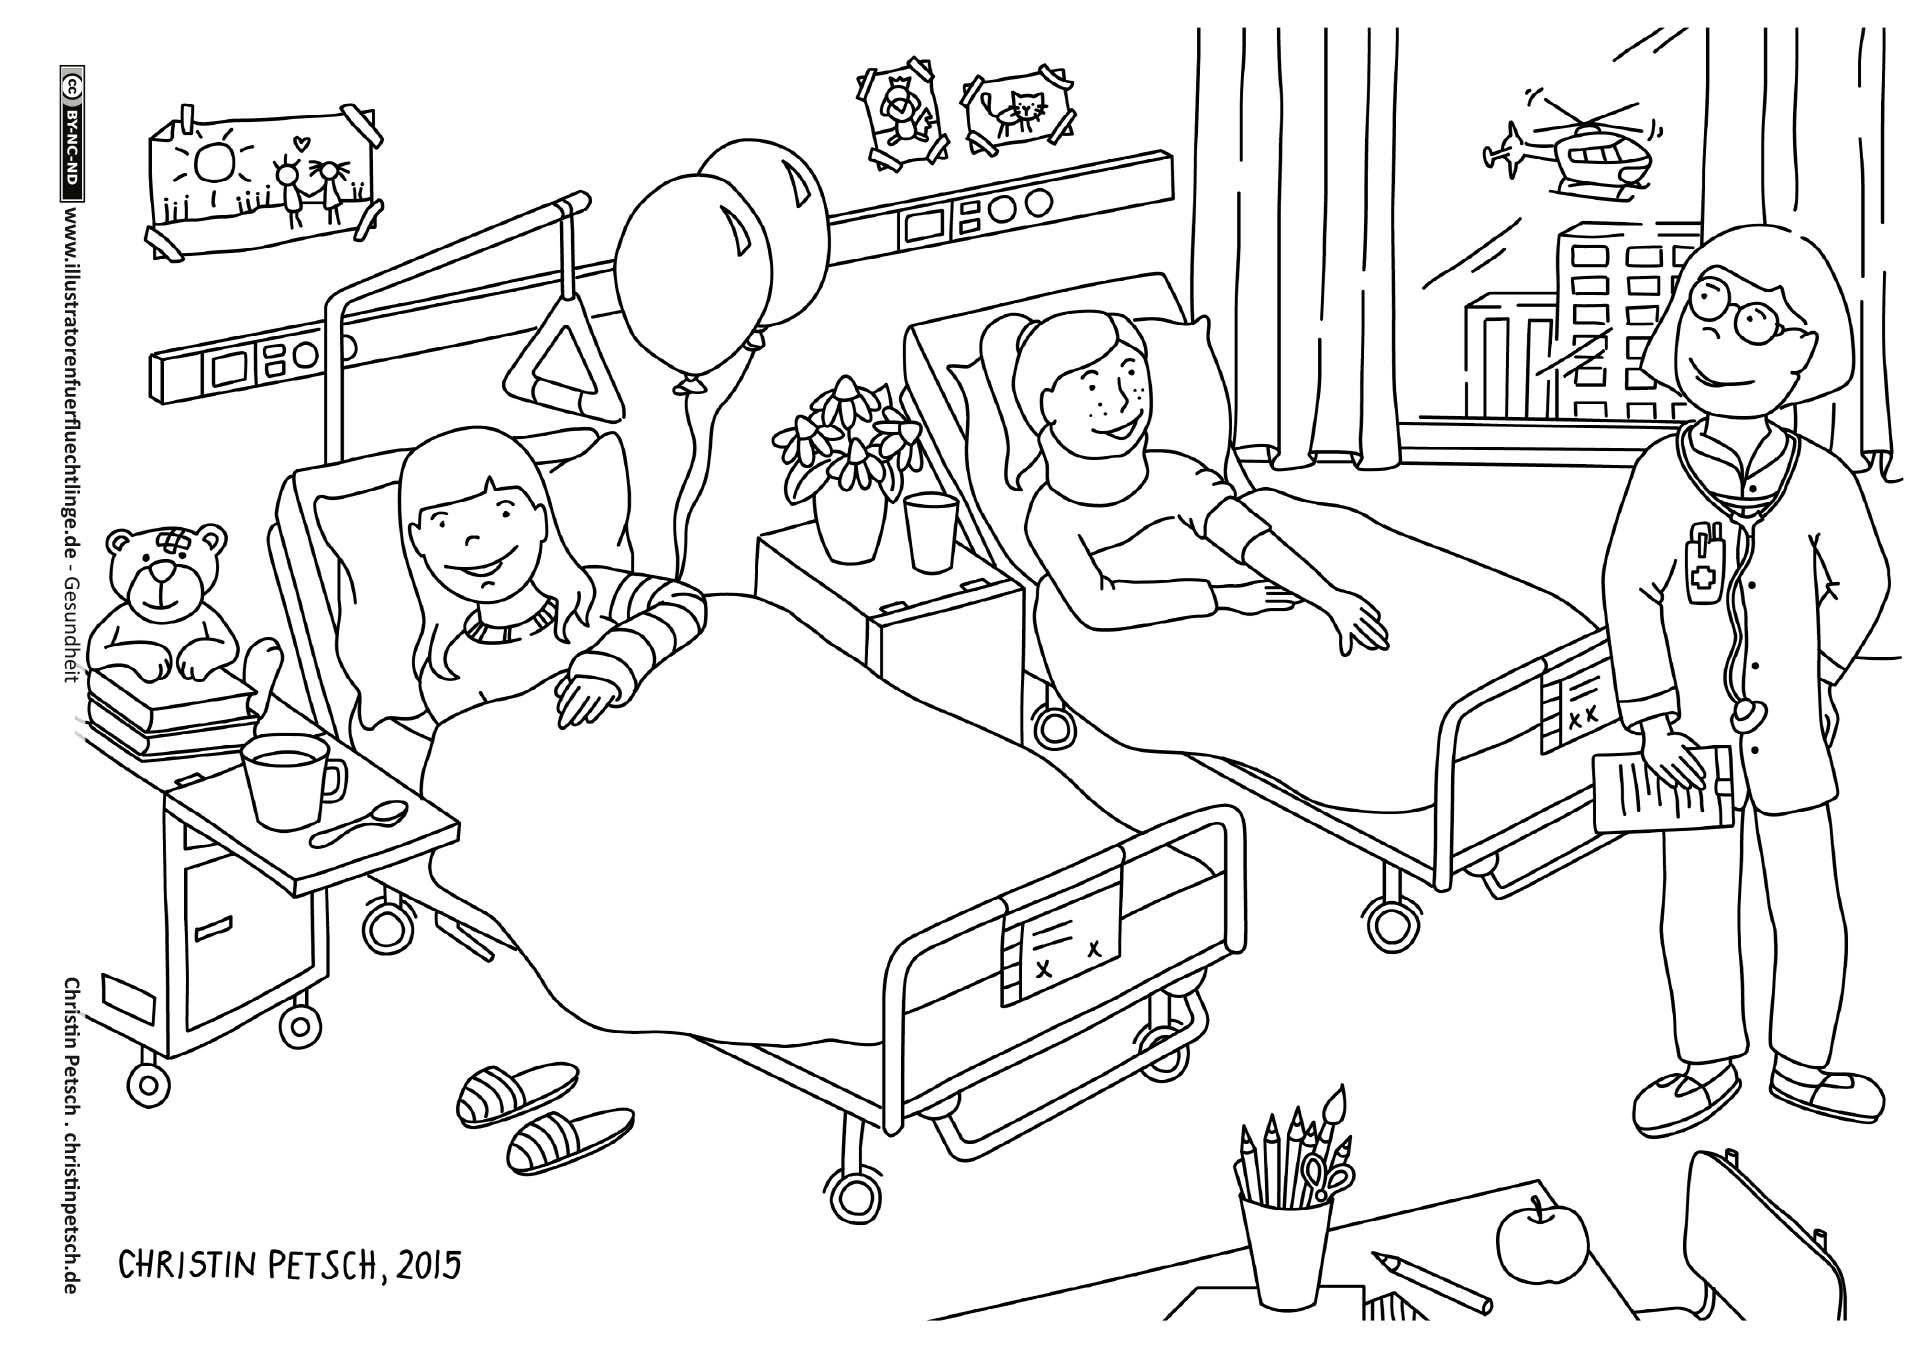 playmobil ausmalbilder krankenhaus  playmobil deutschland